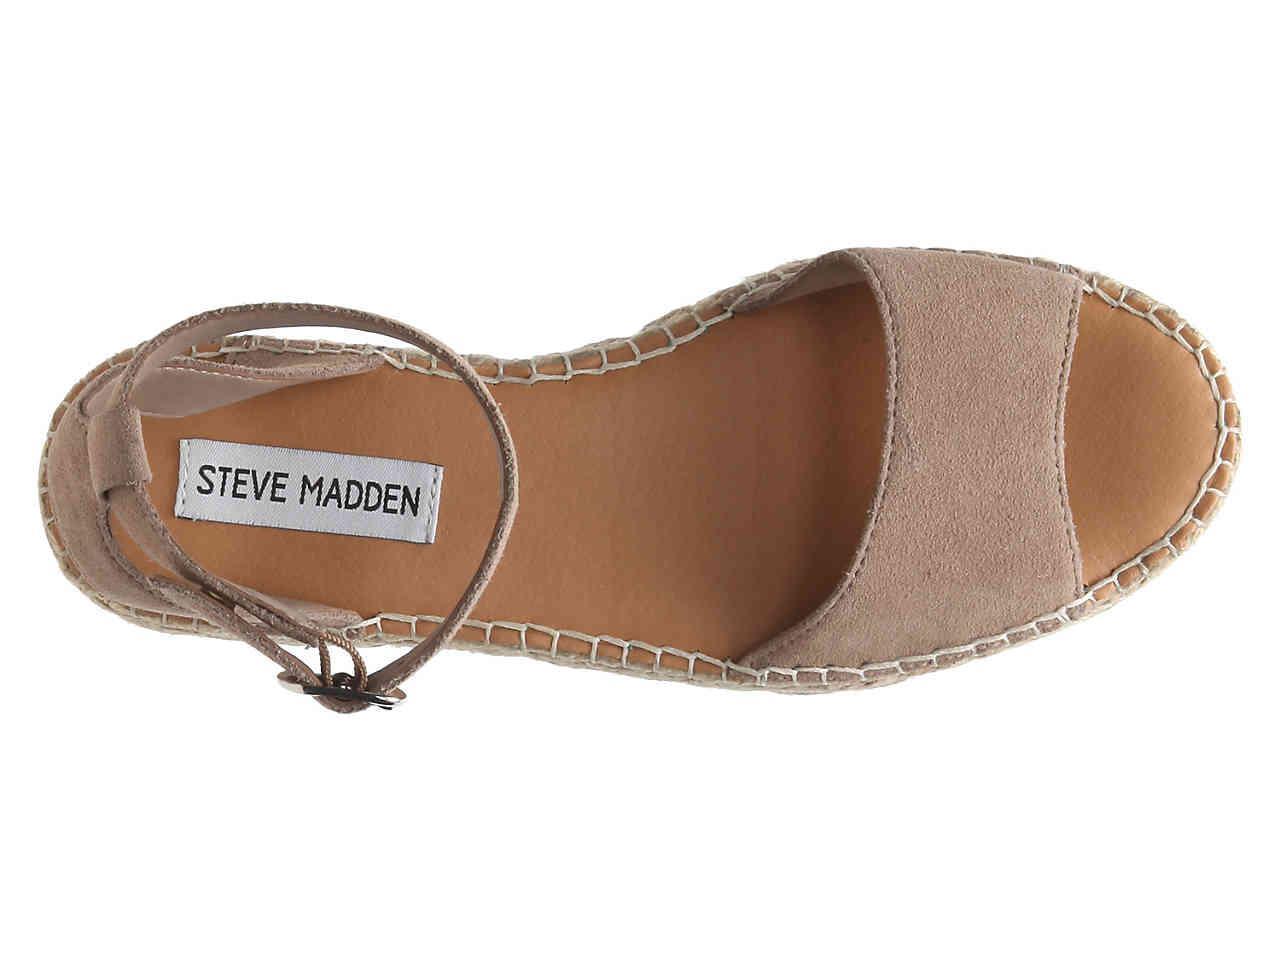 962cfbf7da1 Lyst - Steve Madden Irys Espadrille Platform Sandal